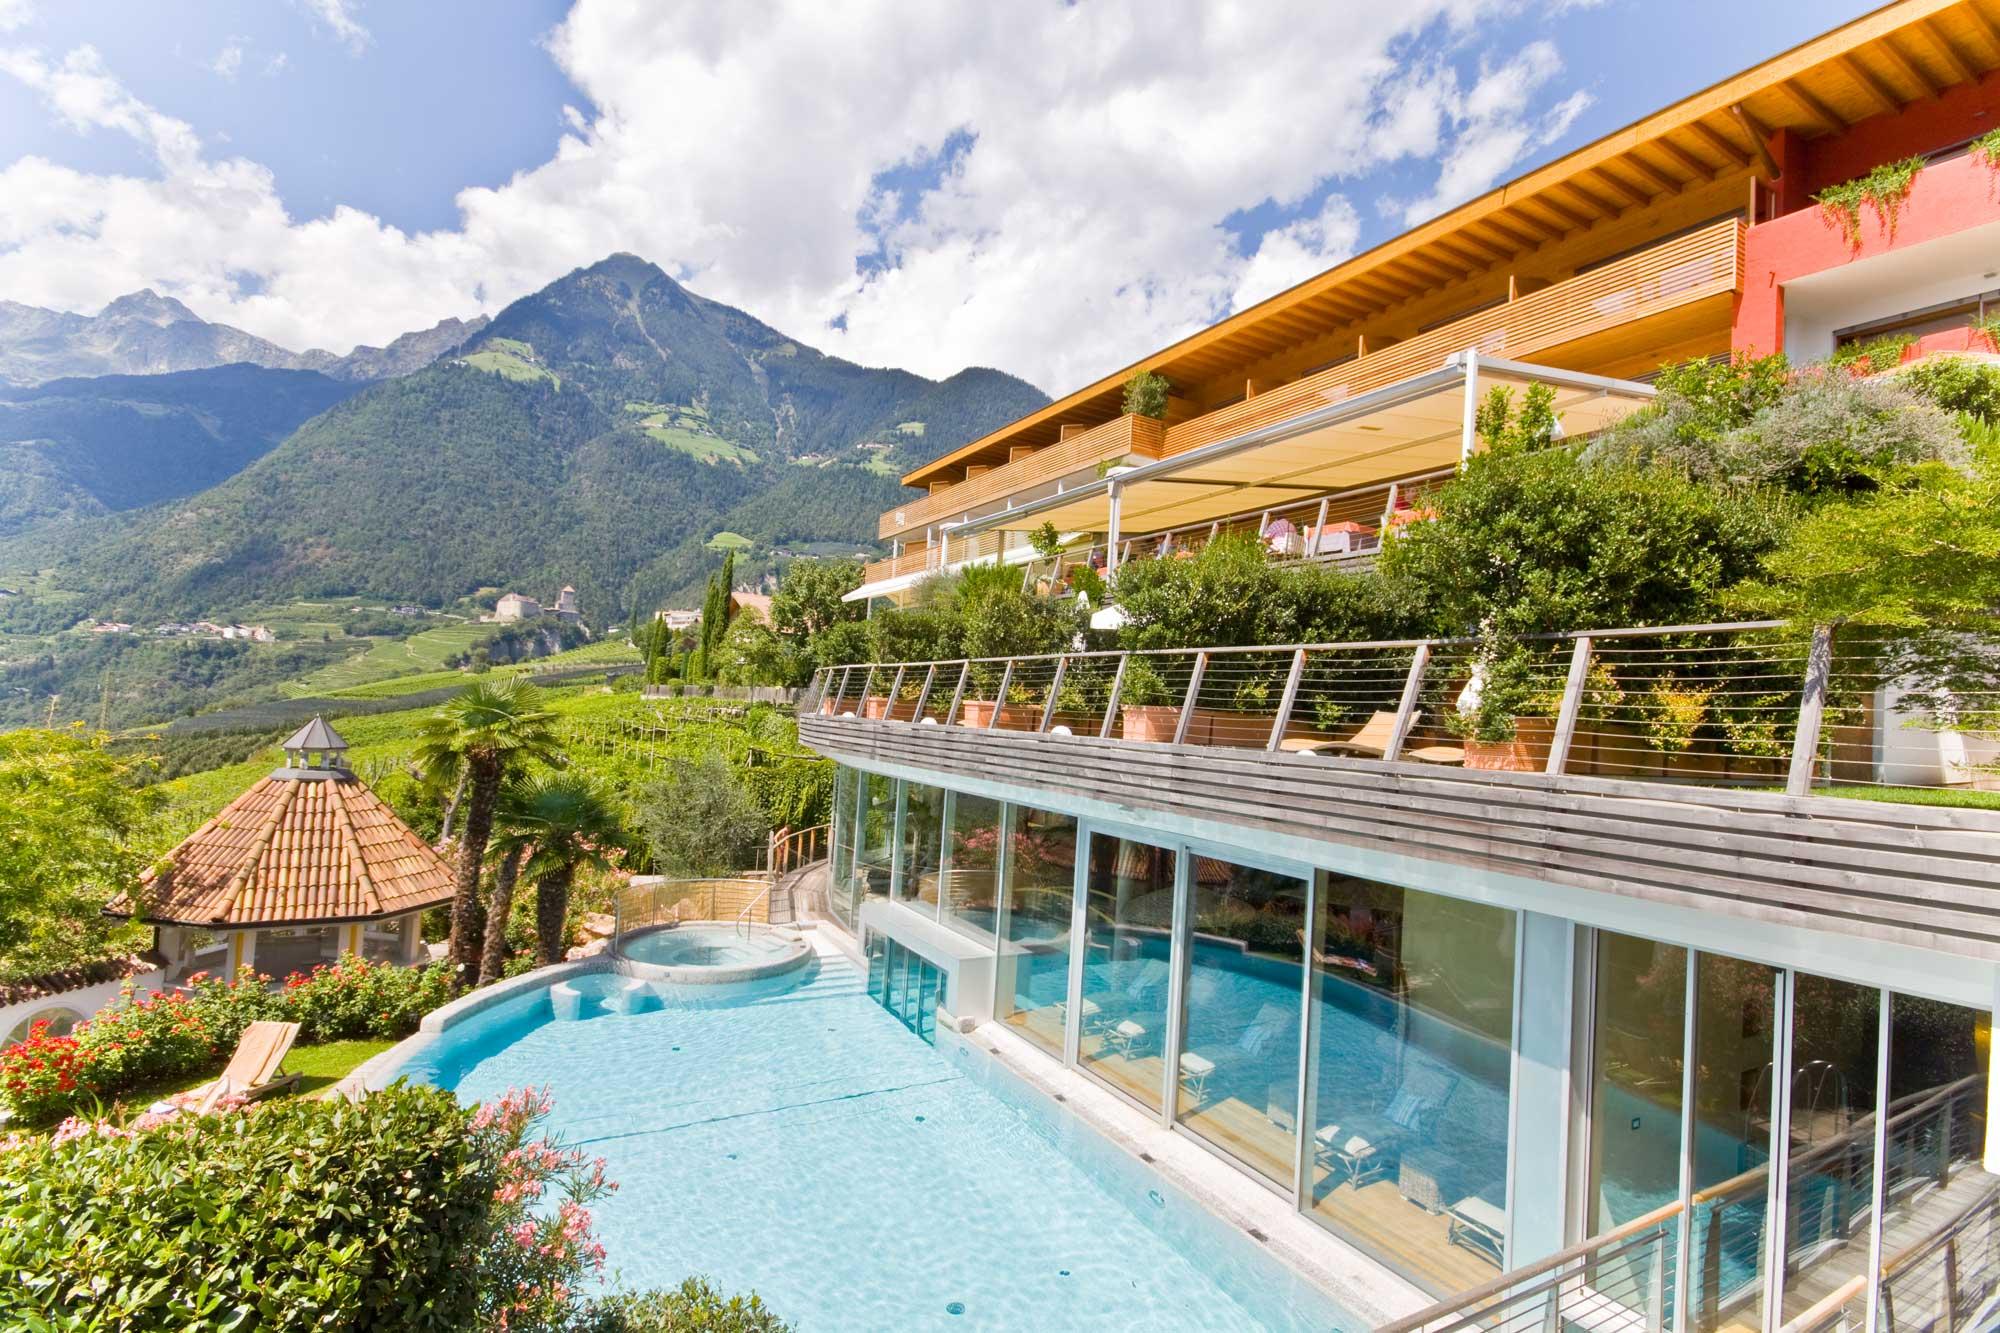 Hotel Erika, Dorf Tirol